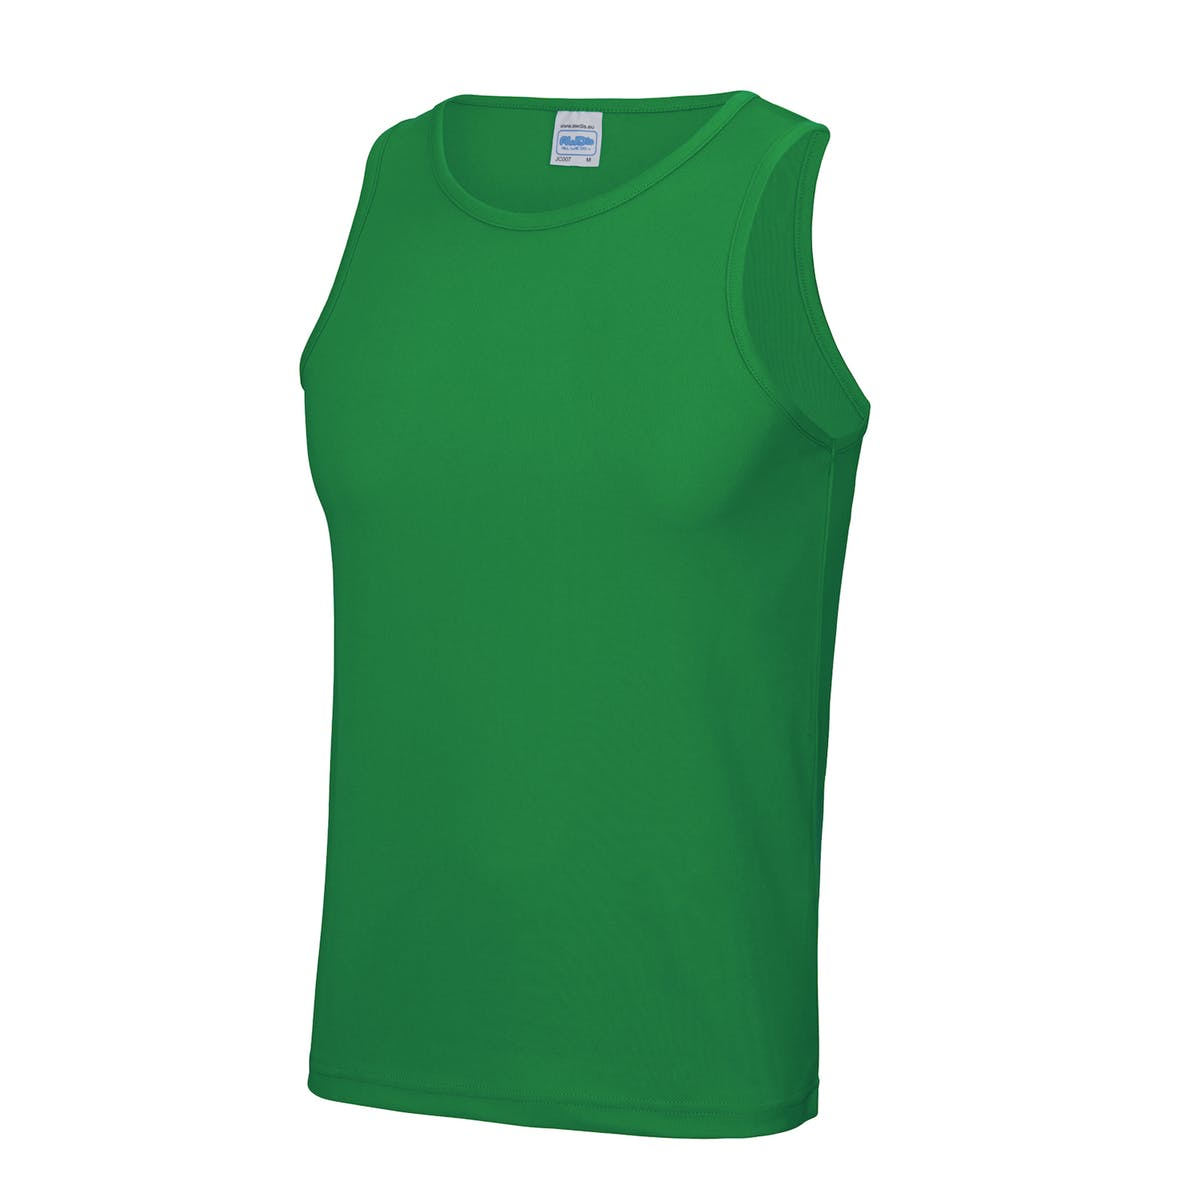 kelly green sports vest